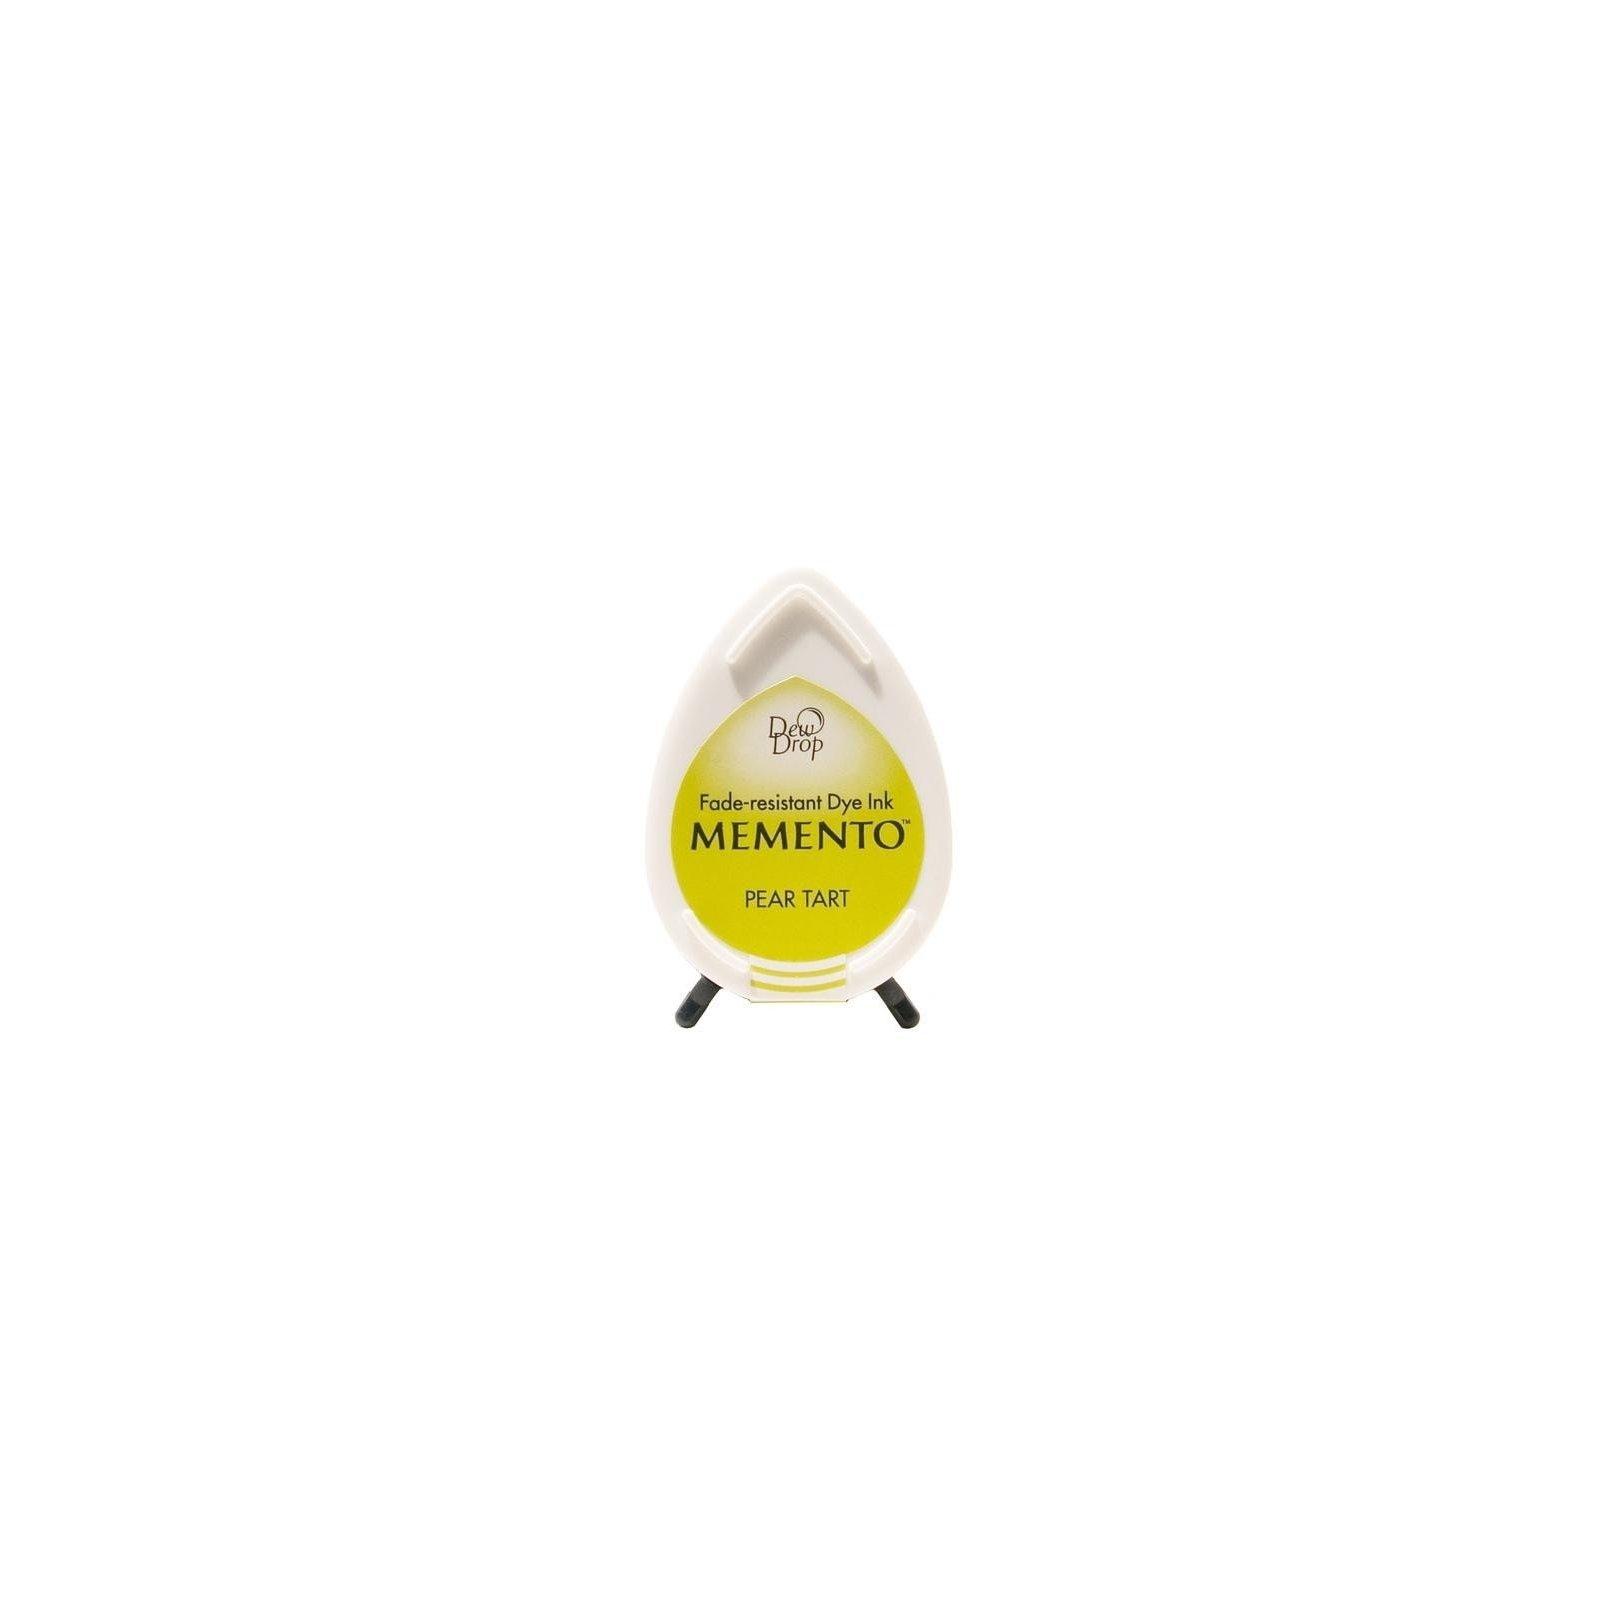 Mini encreur vert Memento Dew Drop - Pear tart - Tsukineko